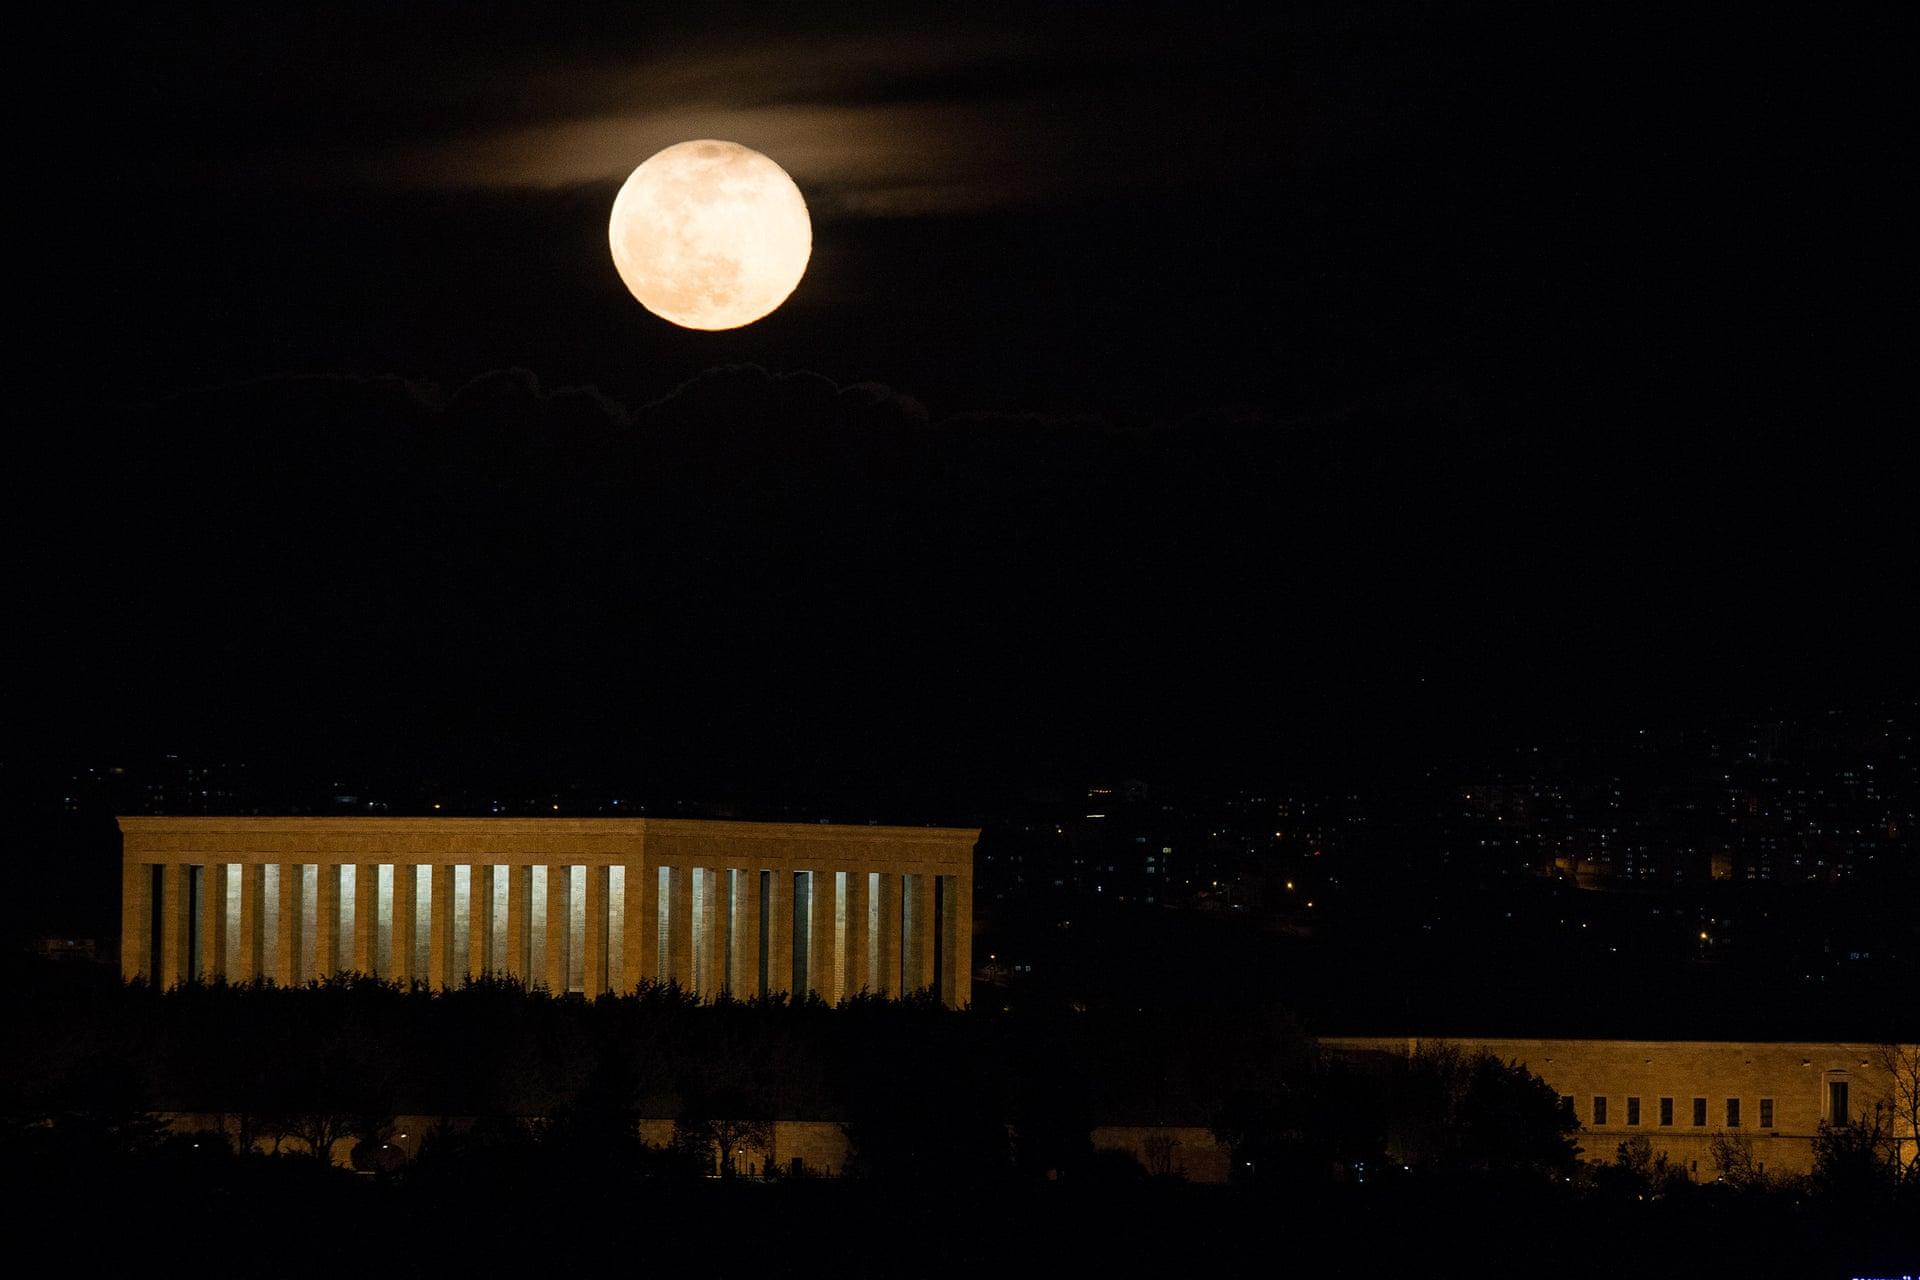 La super luna sorge sopra Anitkabir, il mausoleo del fondatore della Turchia, Mustafa Kemal Ataturk